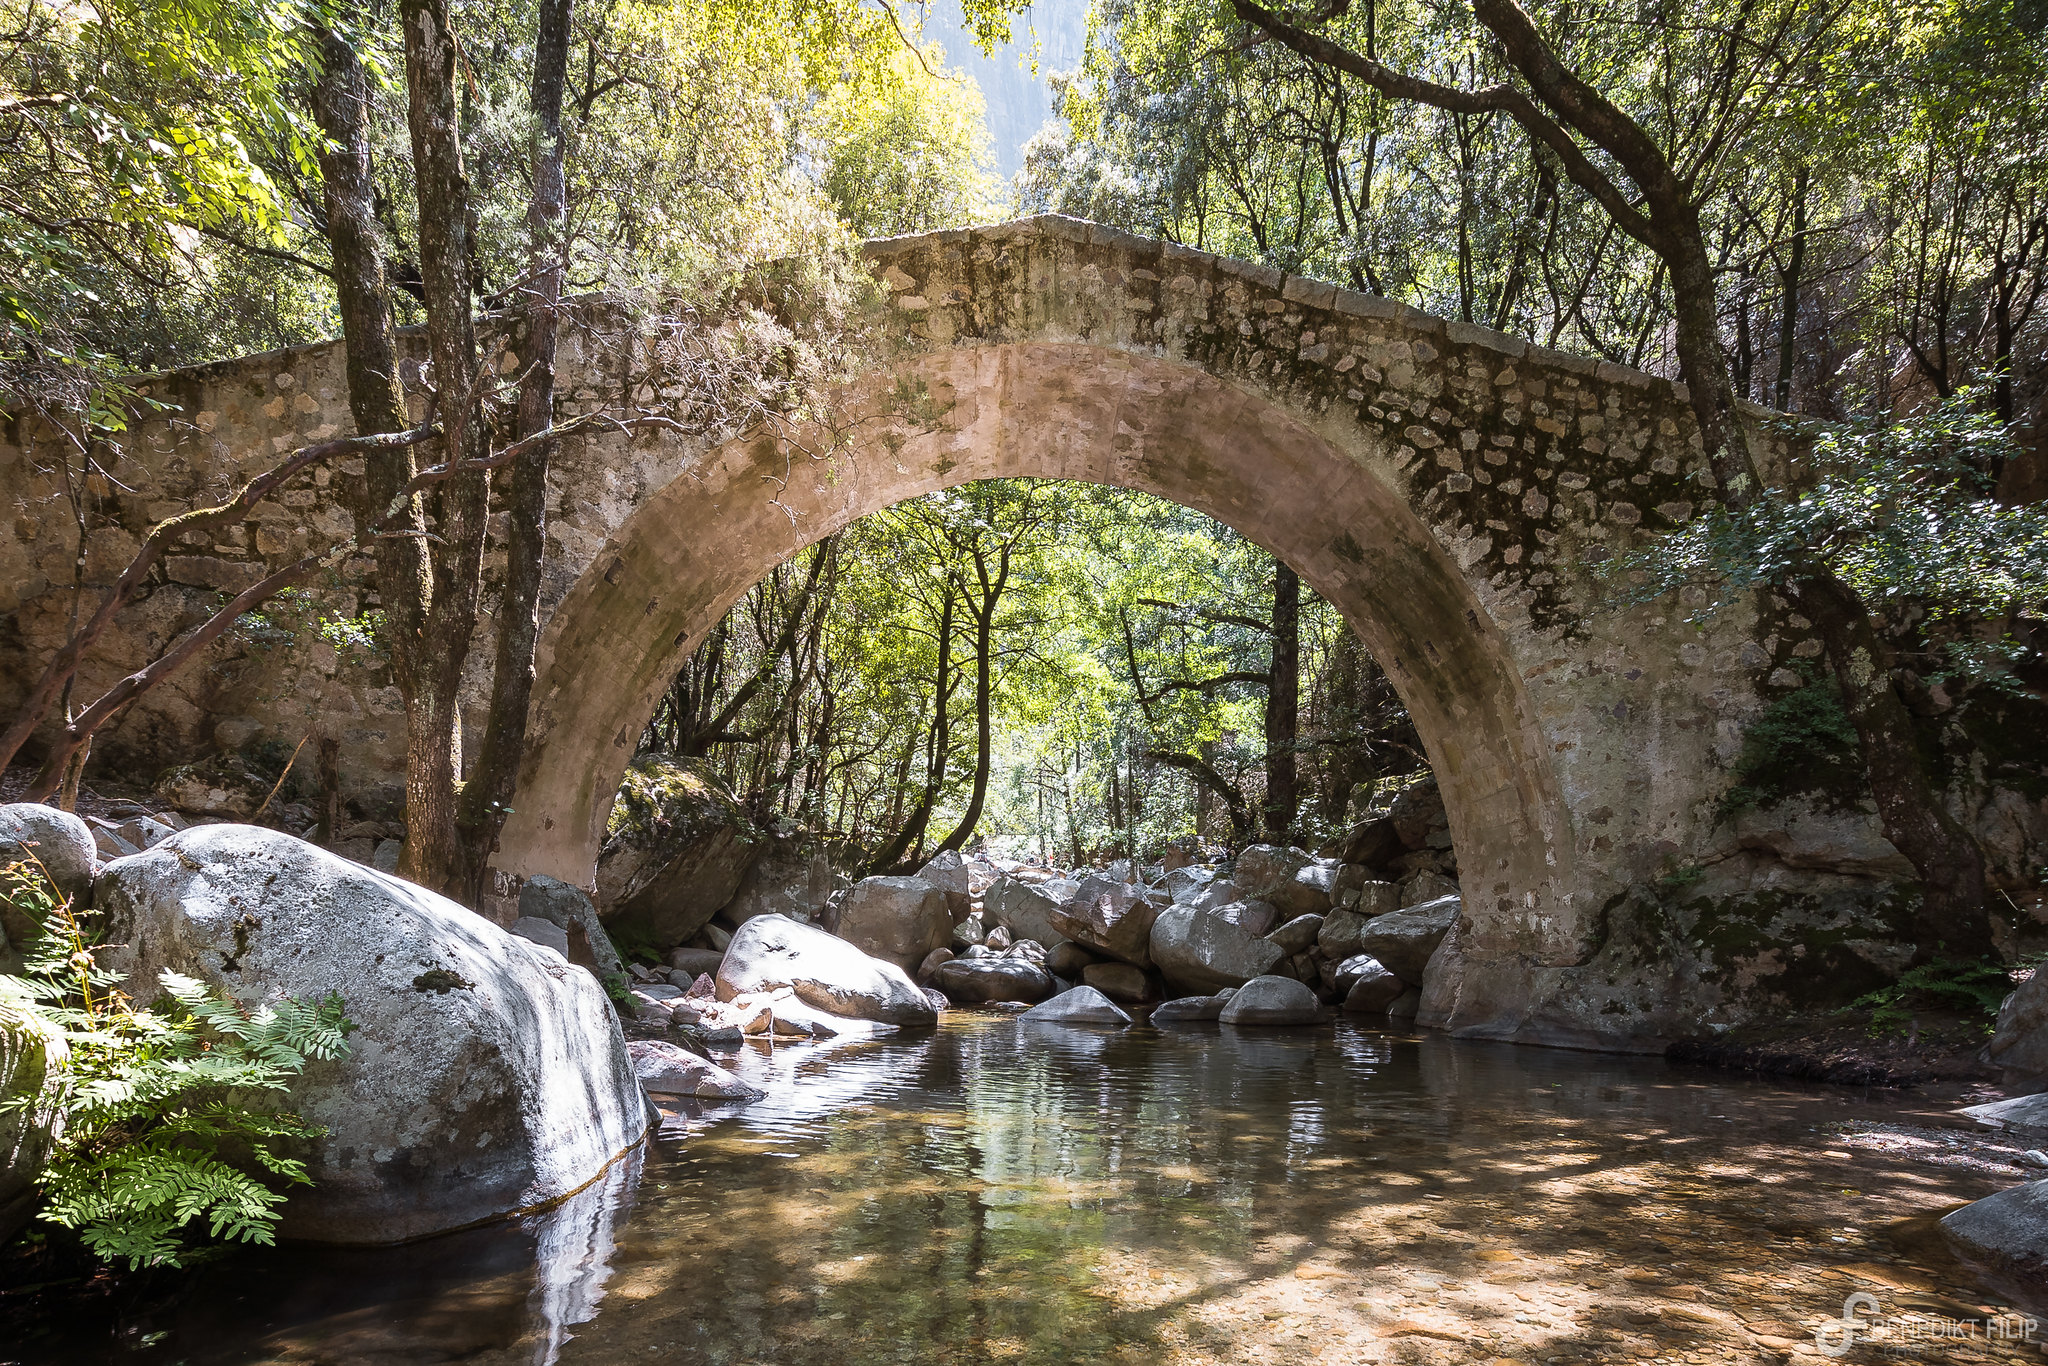 Gorges de la Spelunca, Zaglia-Bridge